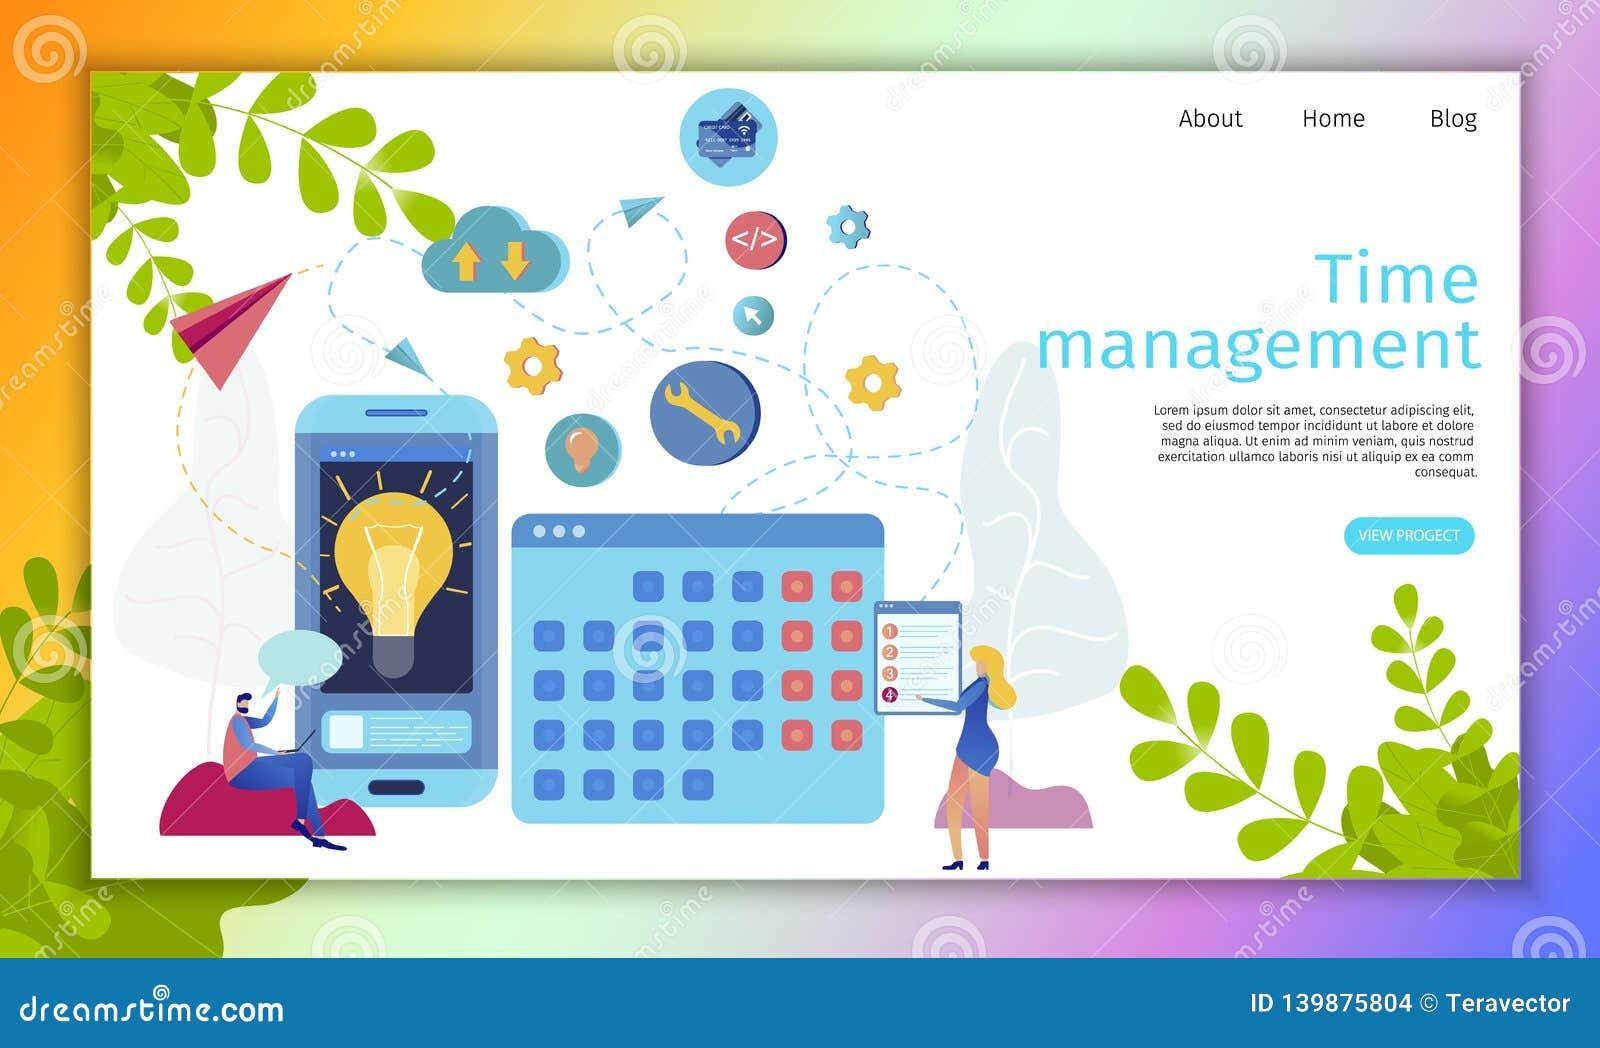 Zeit-Management-Online-Service-Ebenen-Vektor-Website